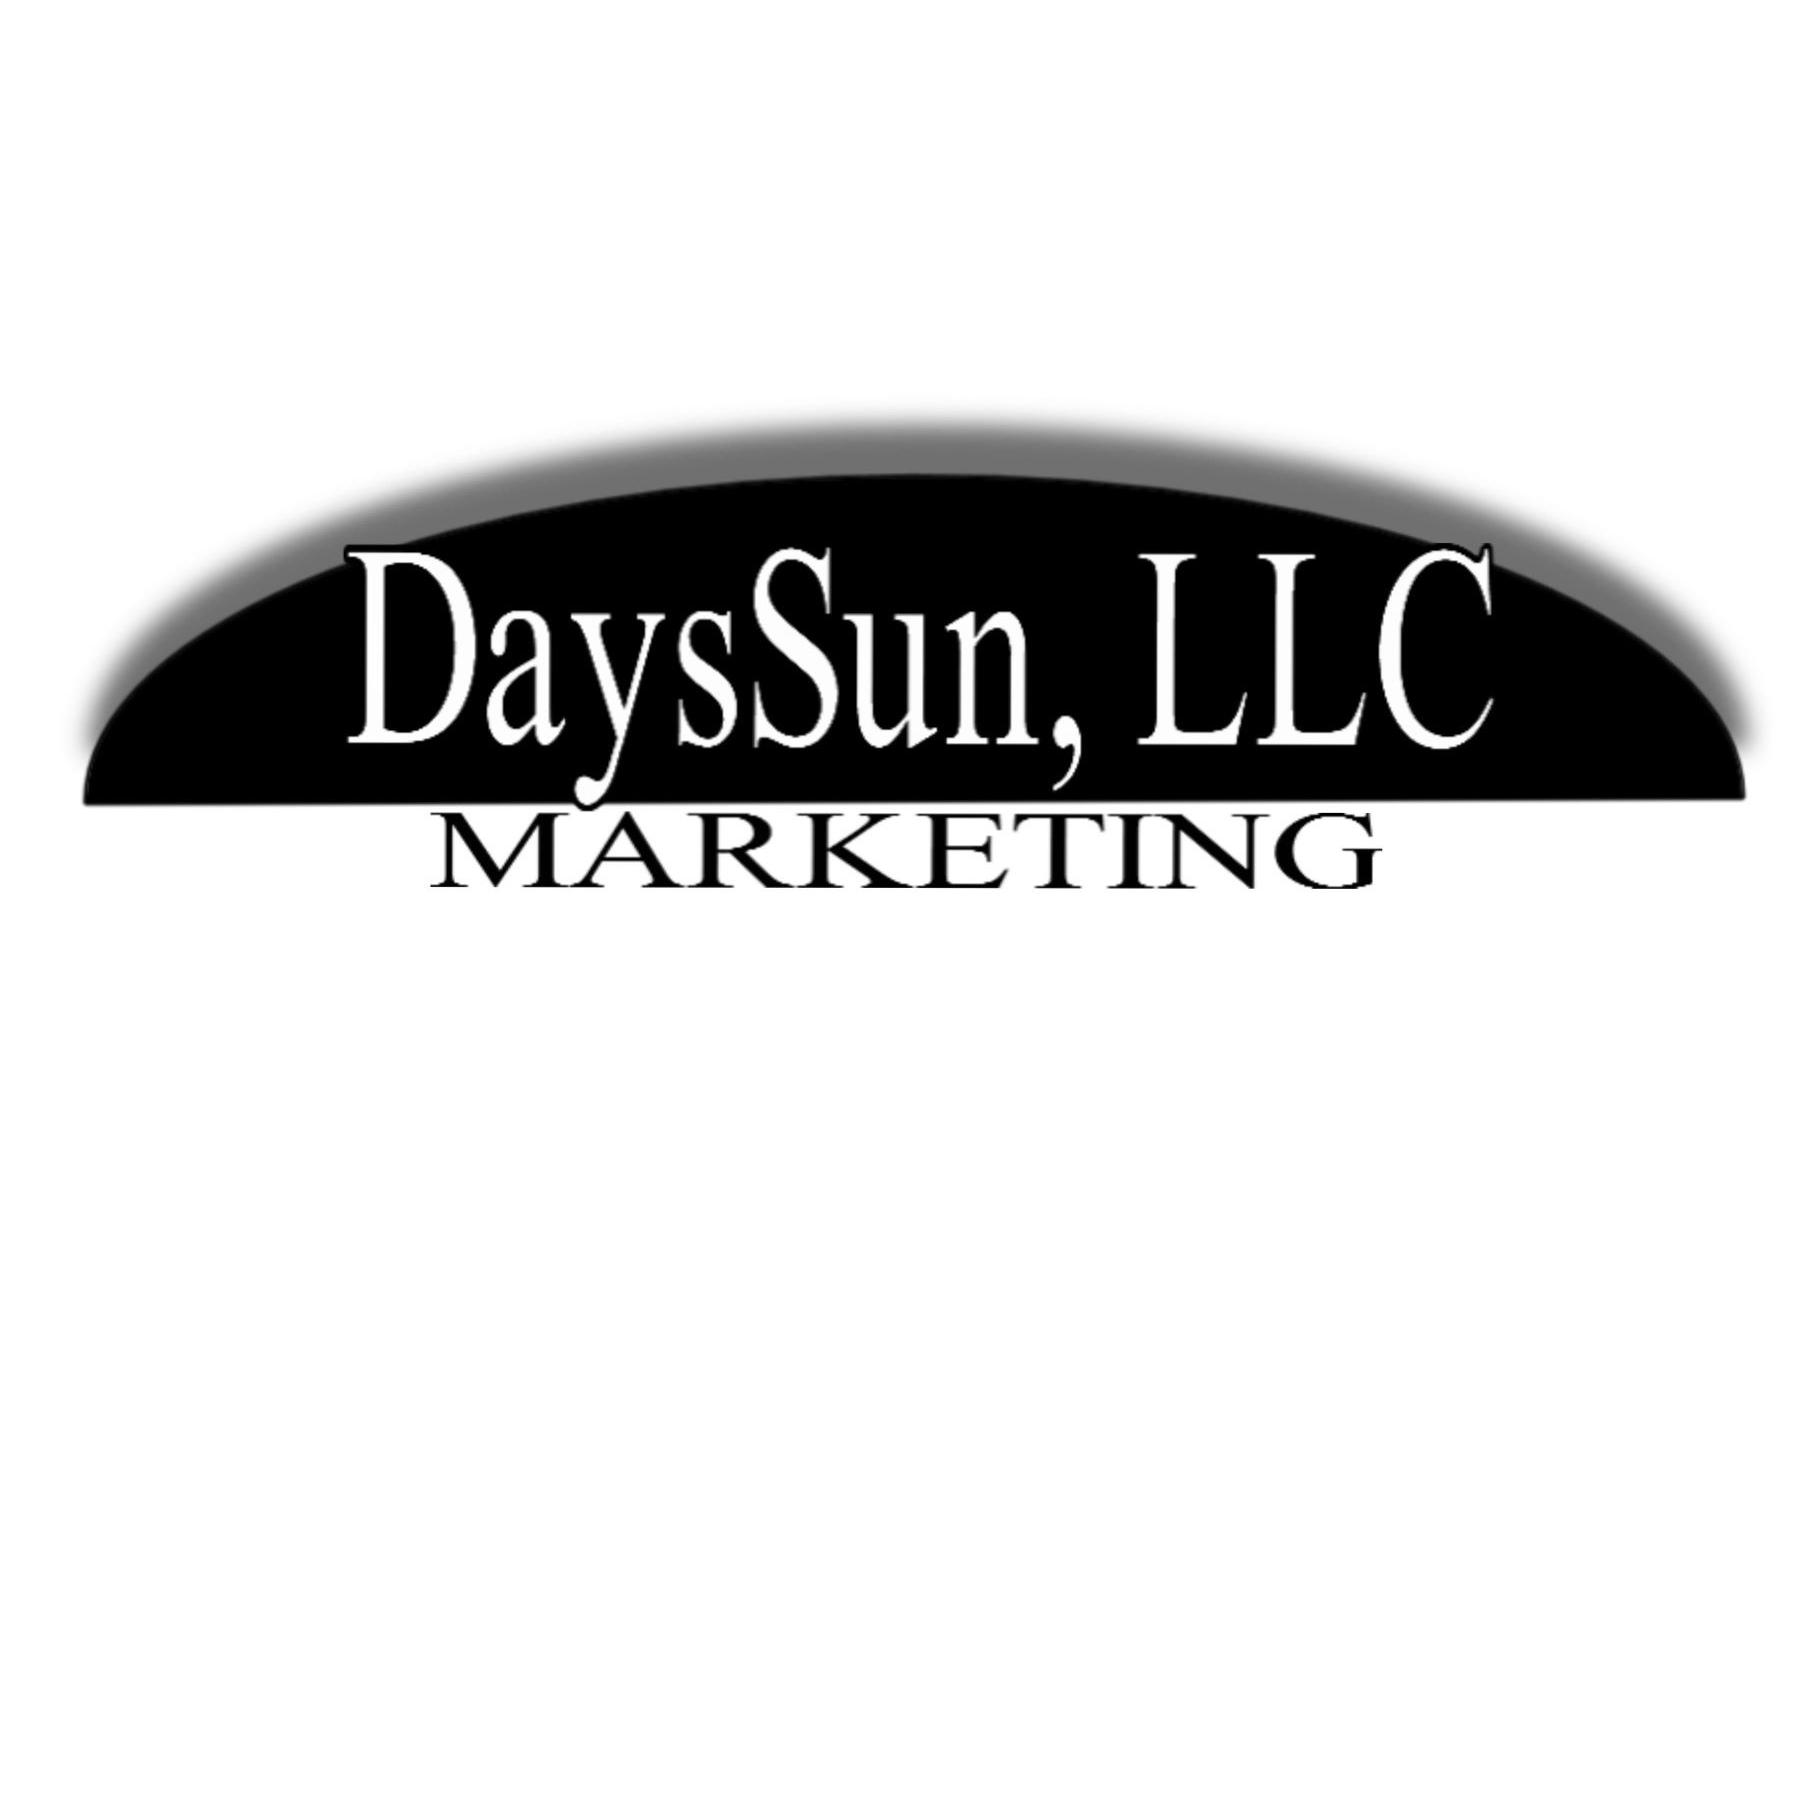 DaysSUN Marketing